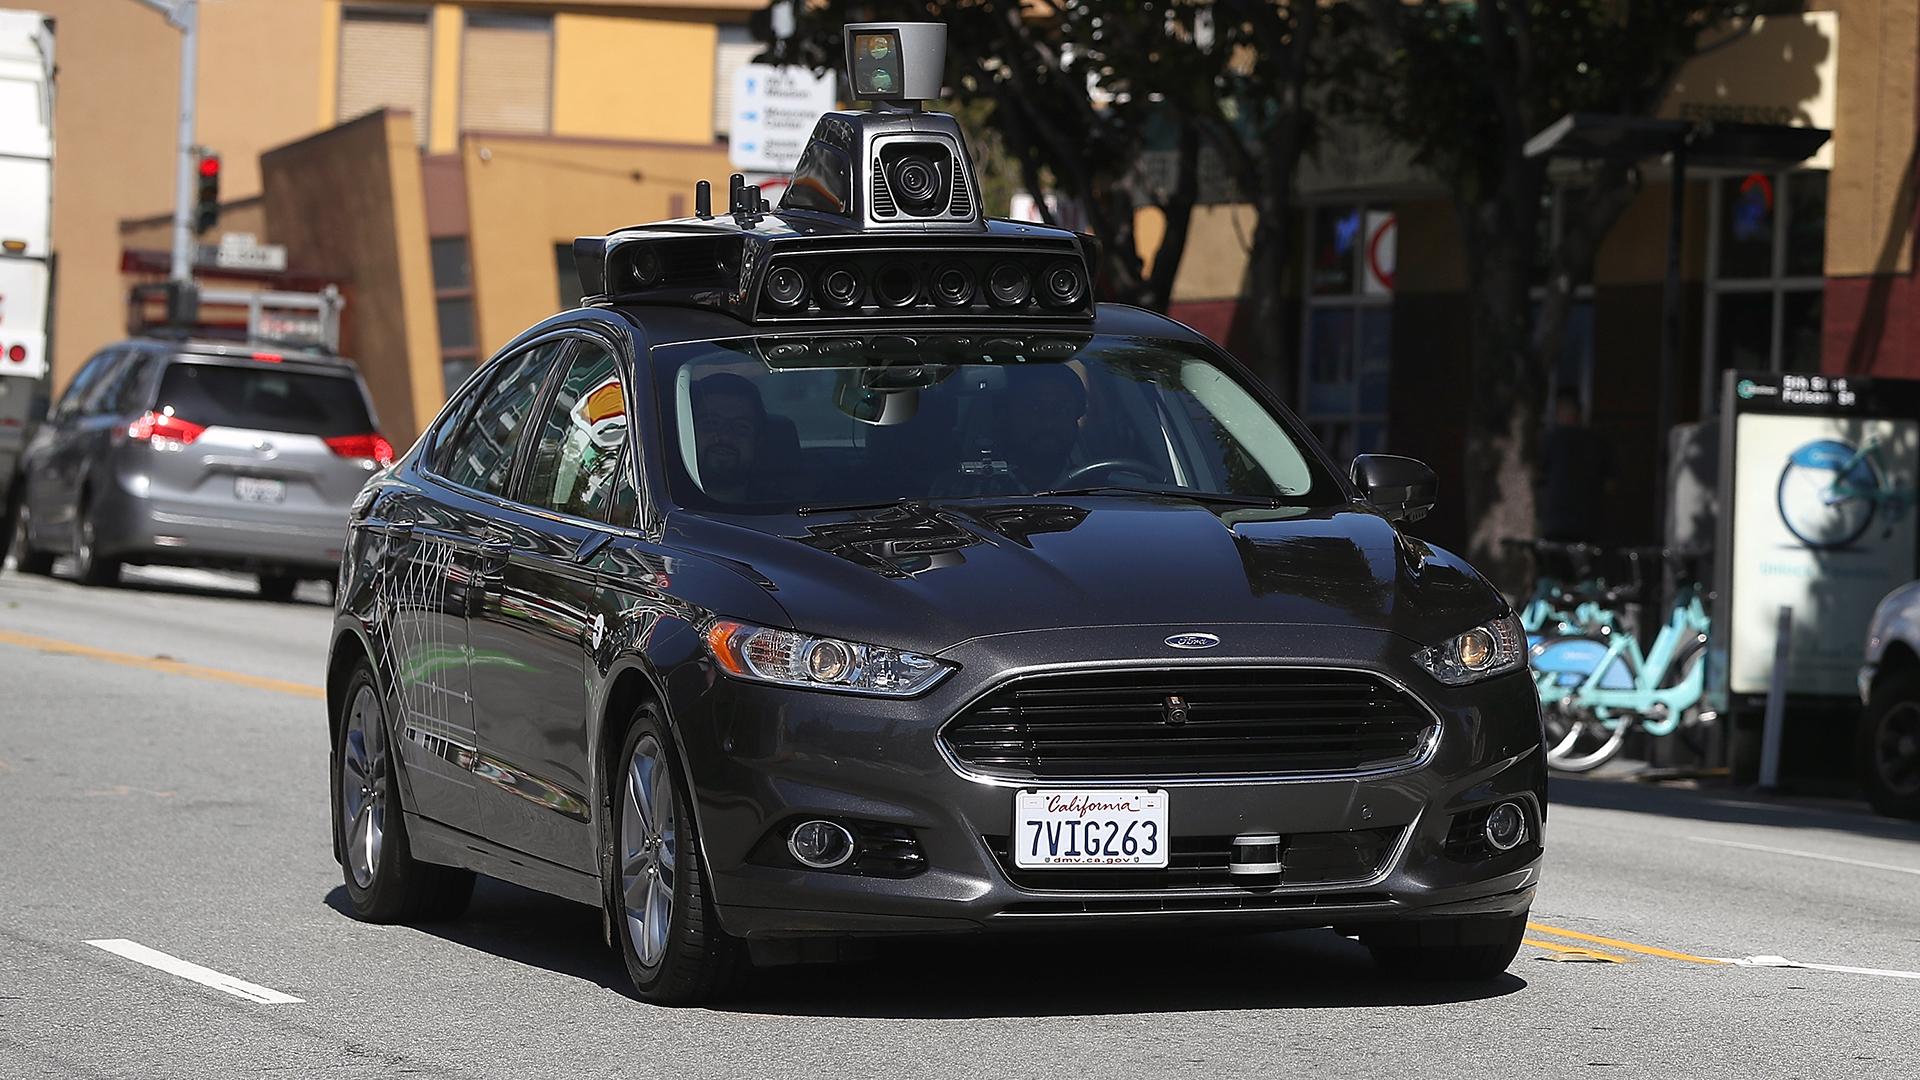 Self-driving Uber car on the road-159532.jpg49715493